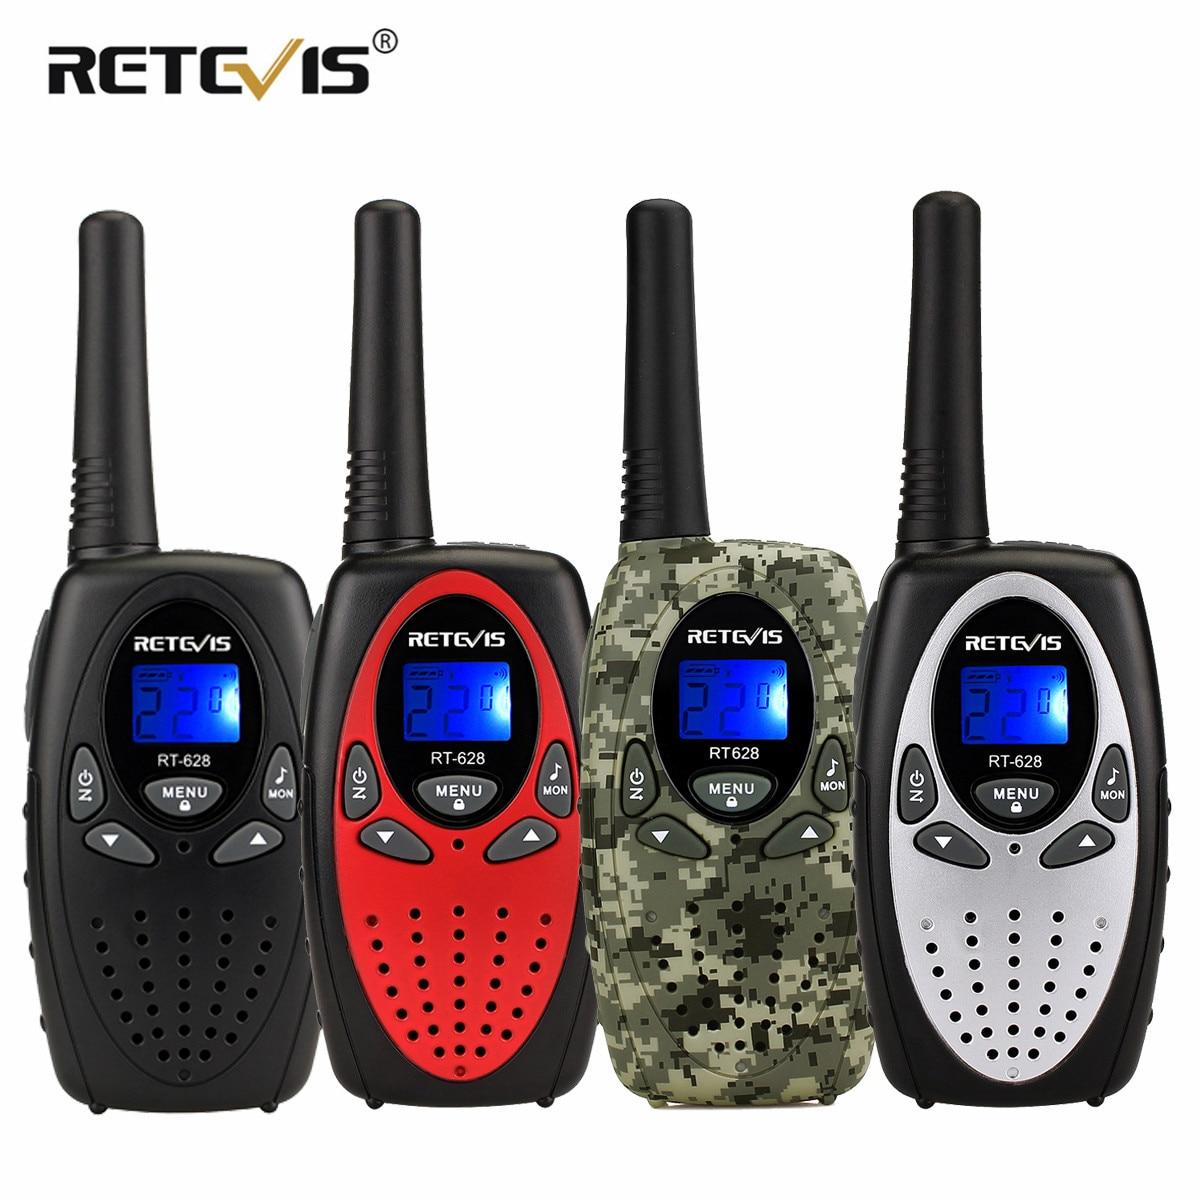 2pcs RETEVIS RT628 Mini Walkie Talkie Kids Radio 0 5W UHF Frequency  Portable Radio Station Handheld